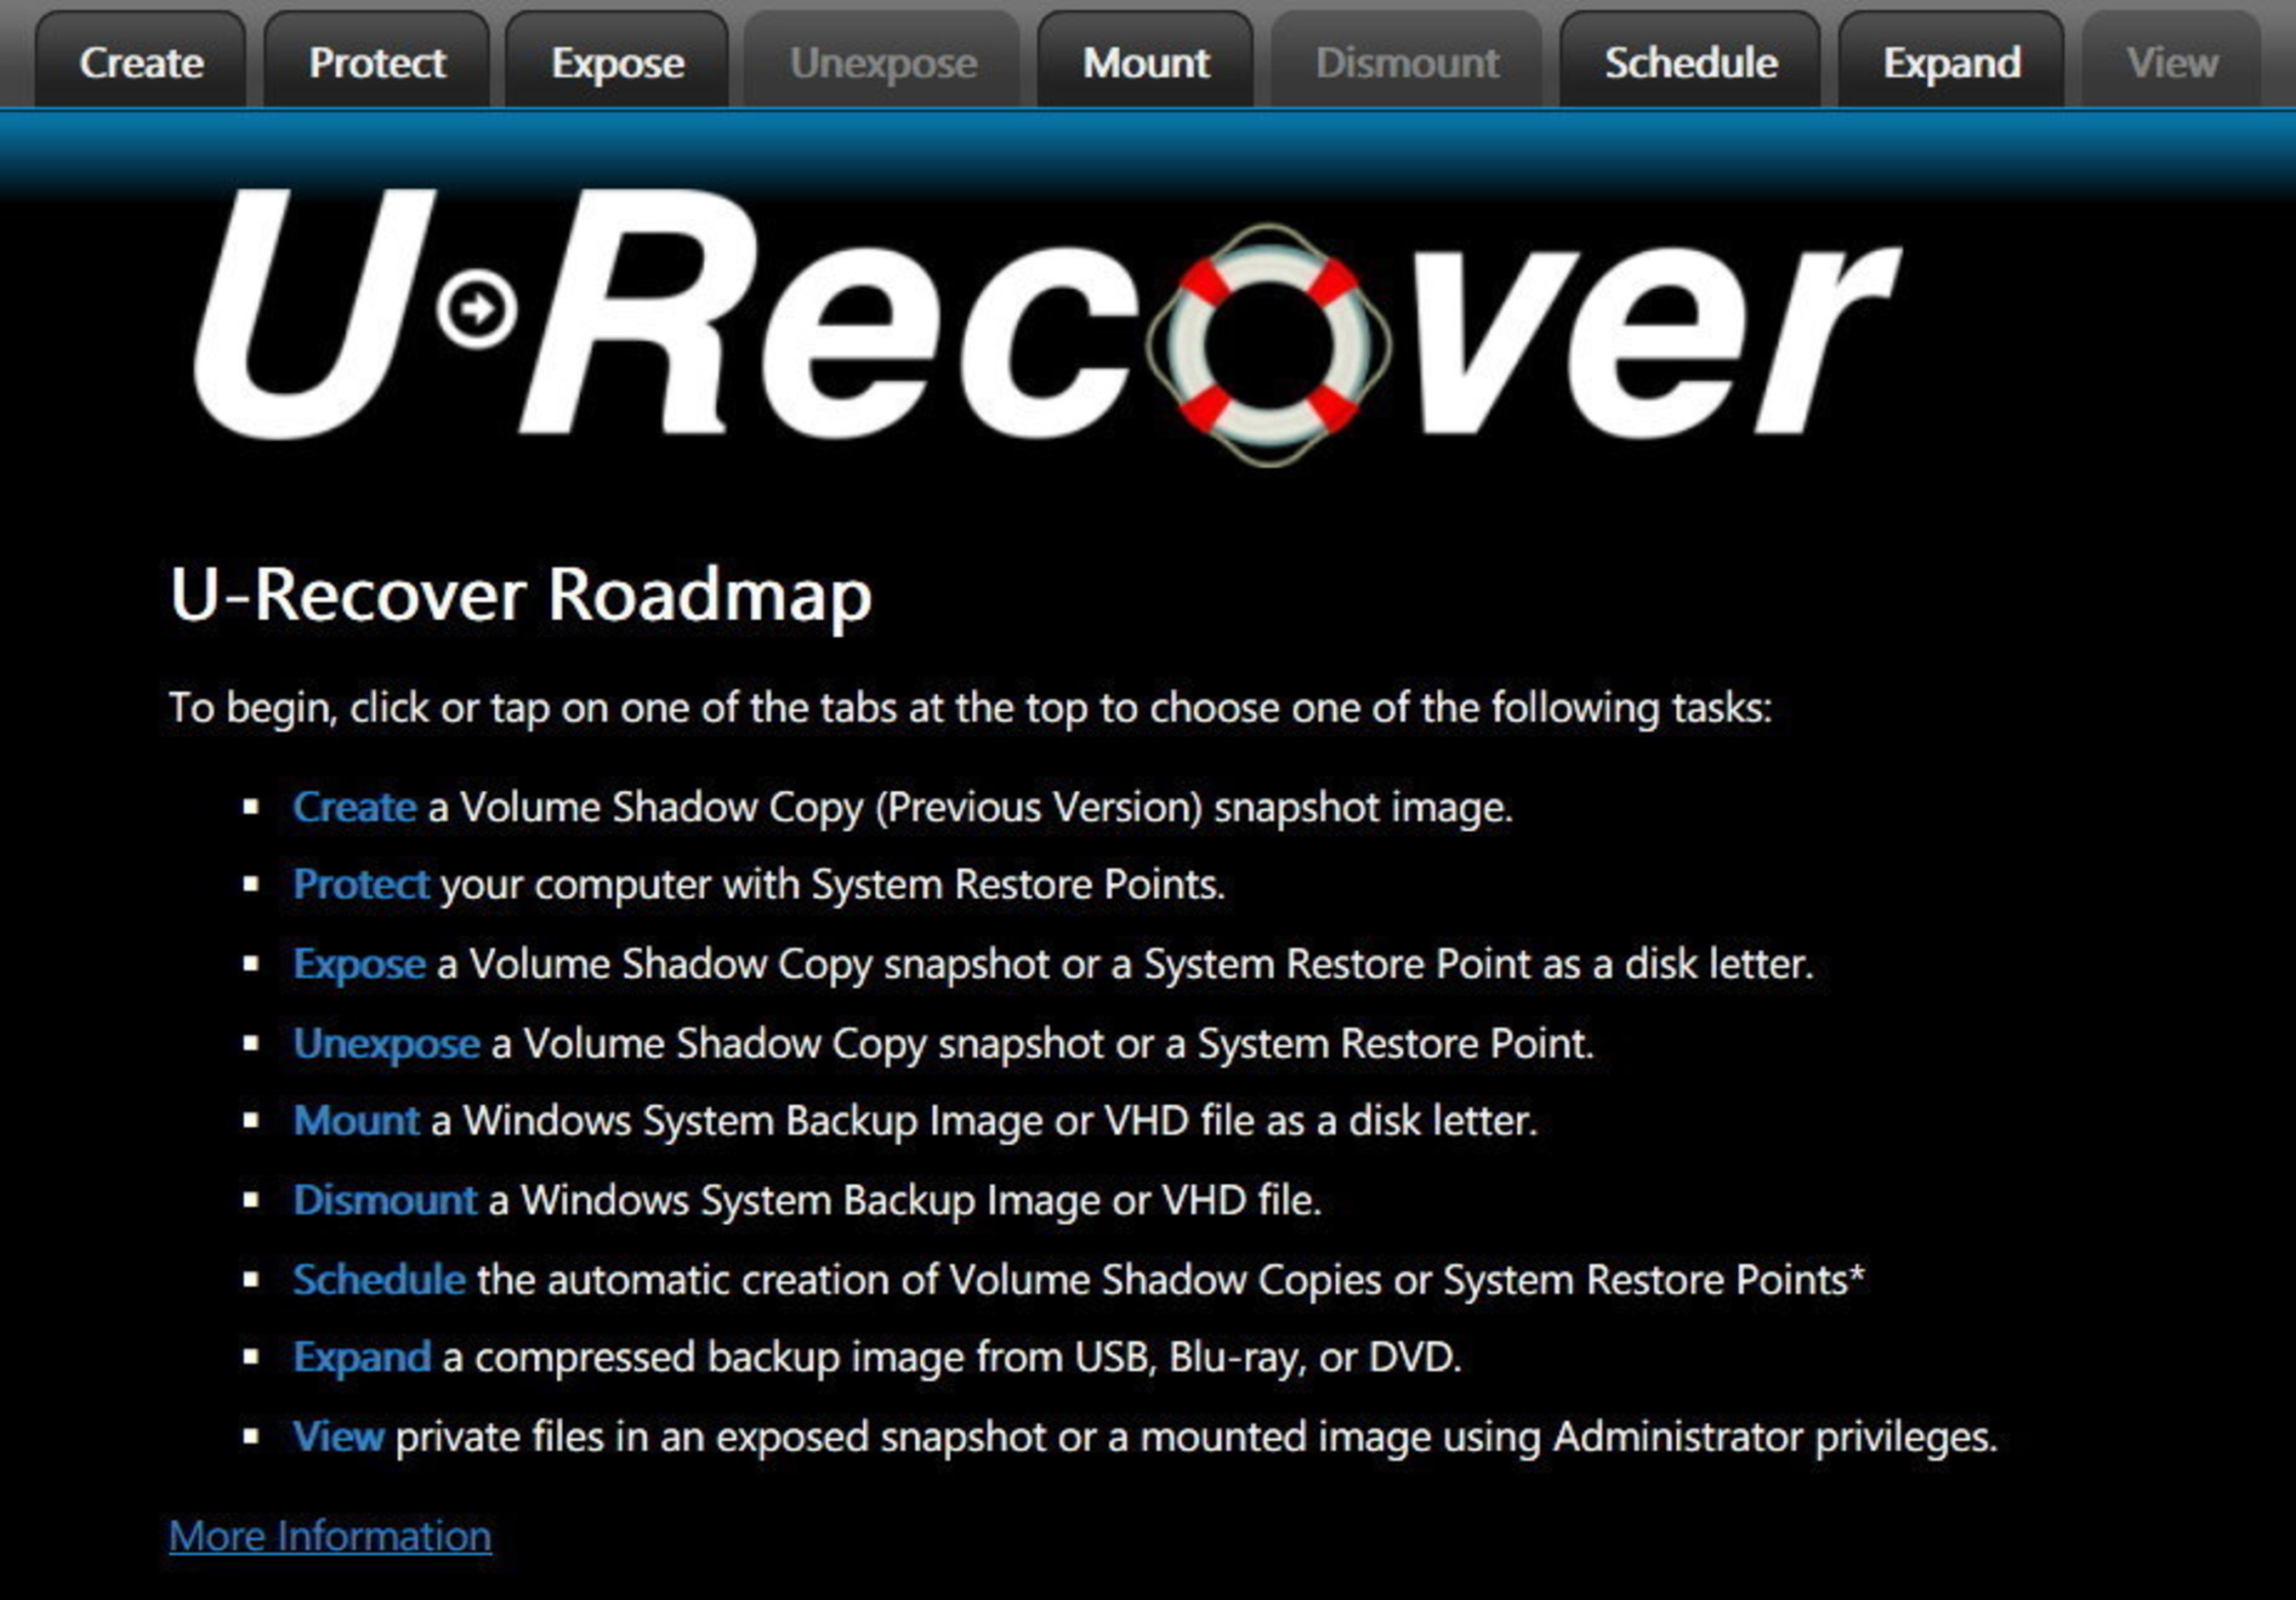 U-Recover application roadmap